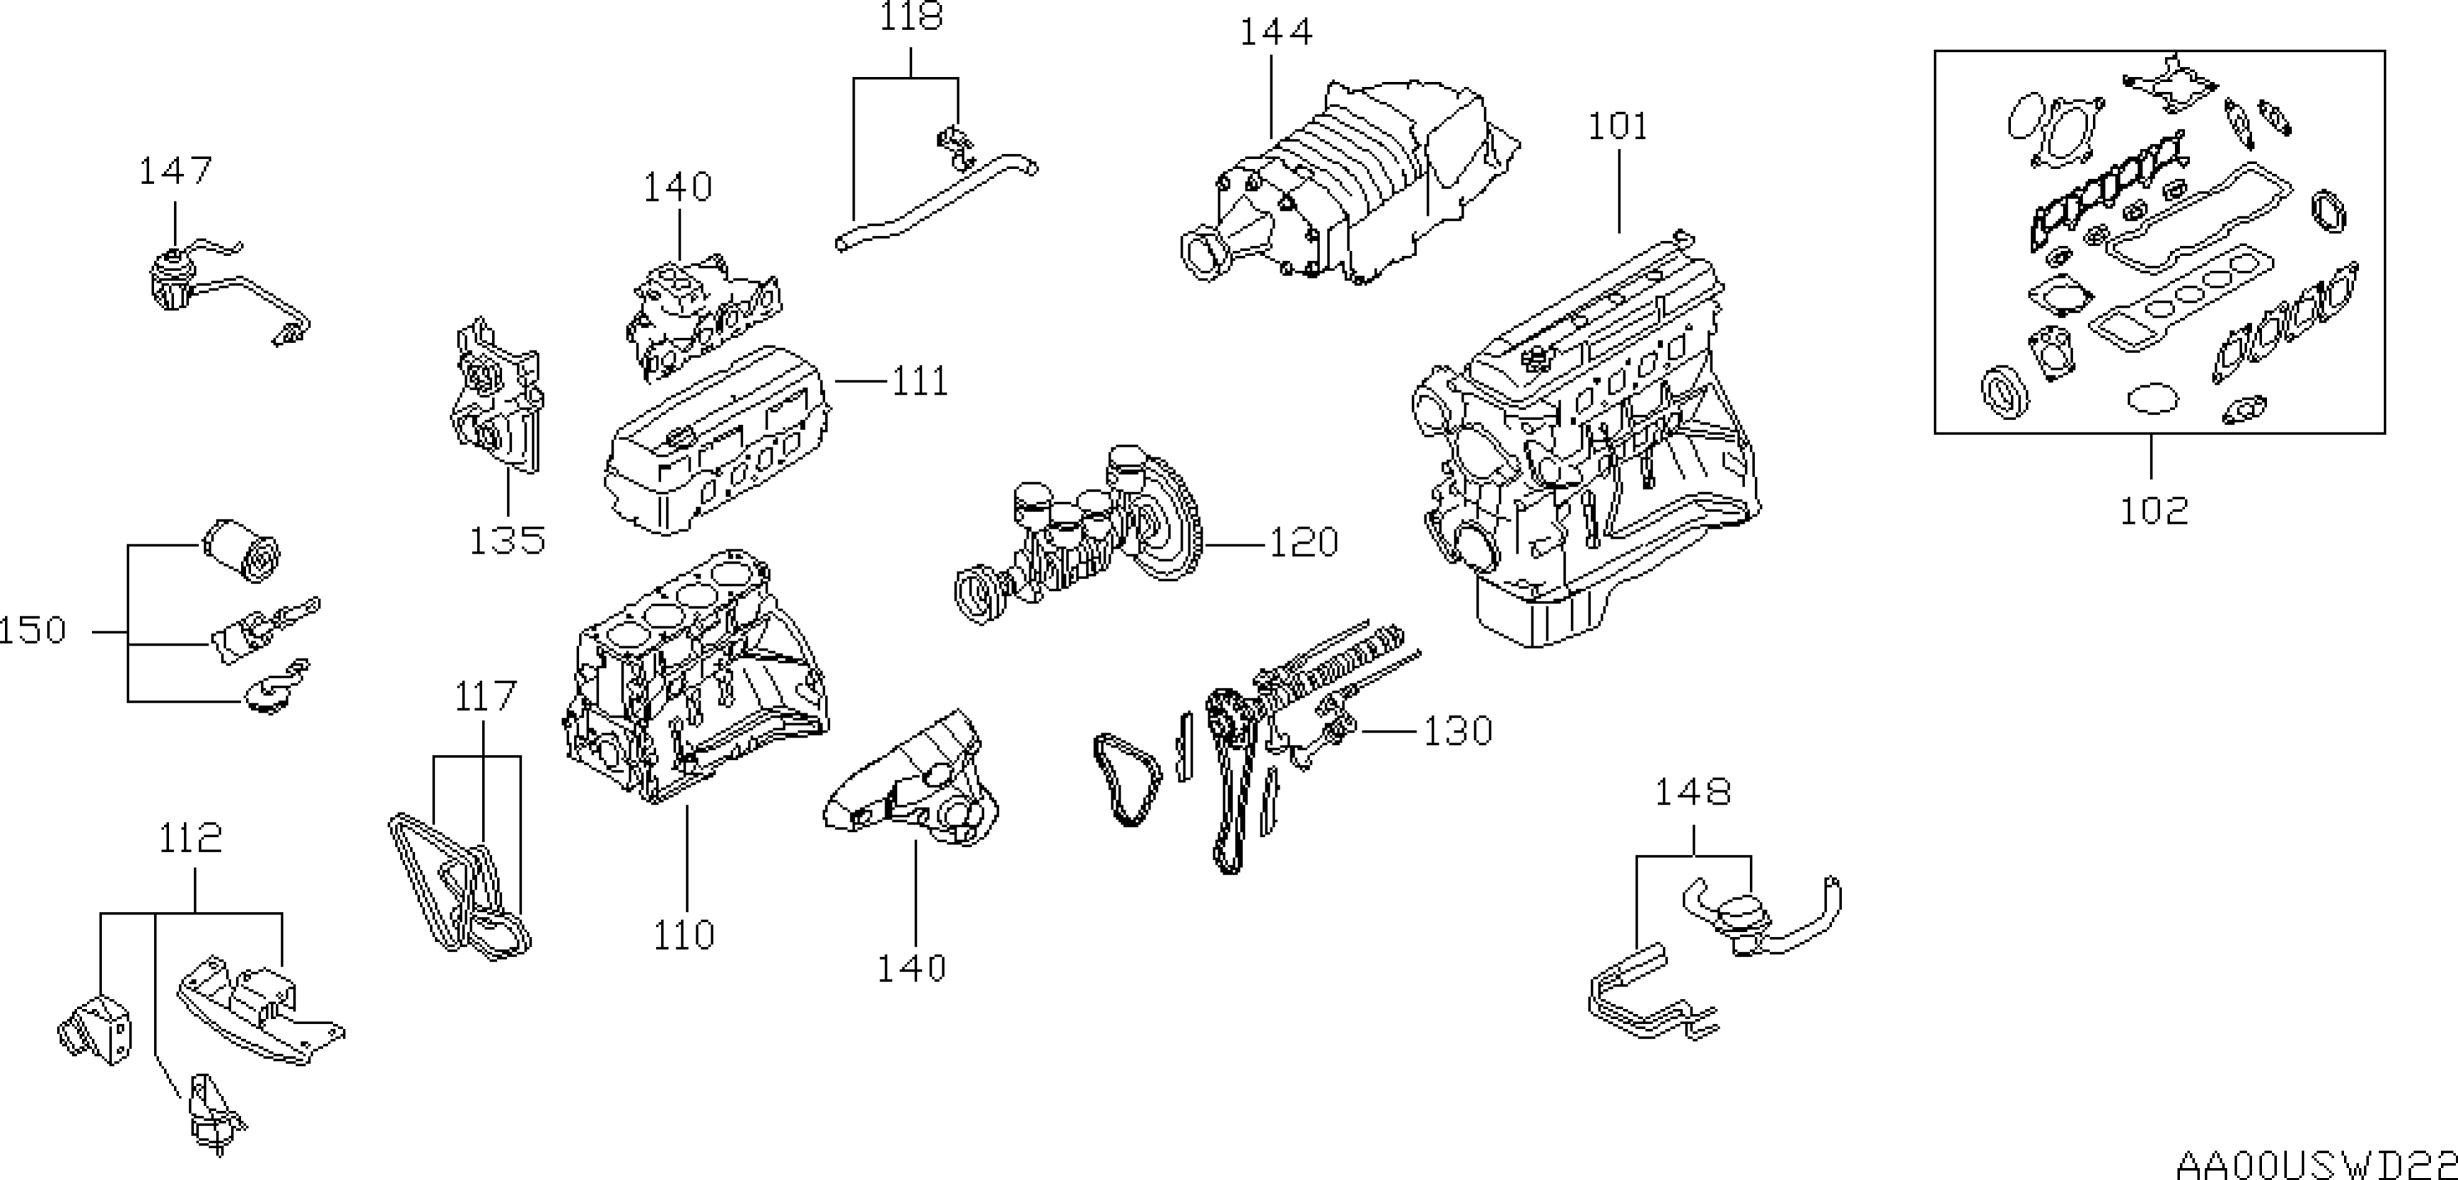 nissan xterra engine diagram nissan xterra engine diagram